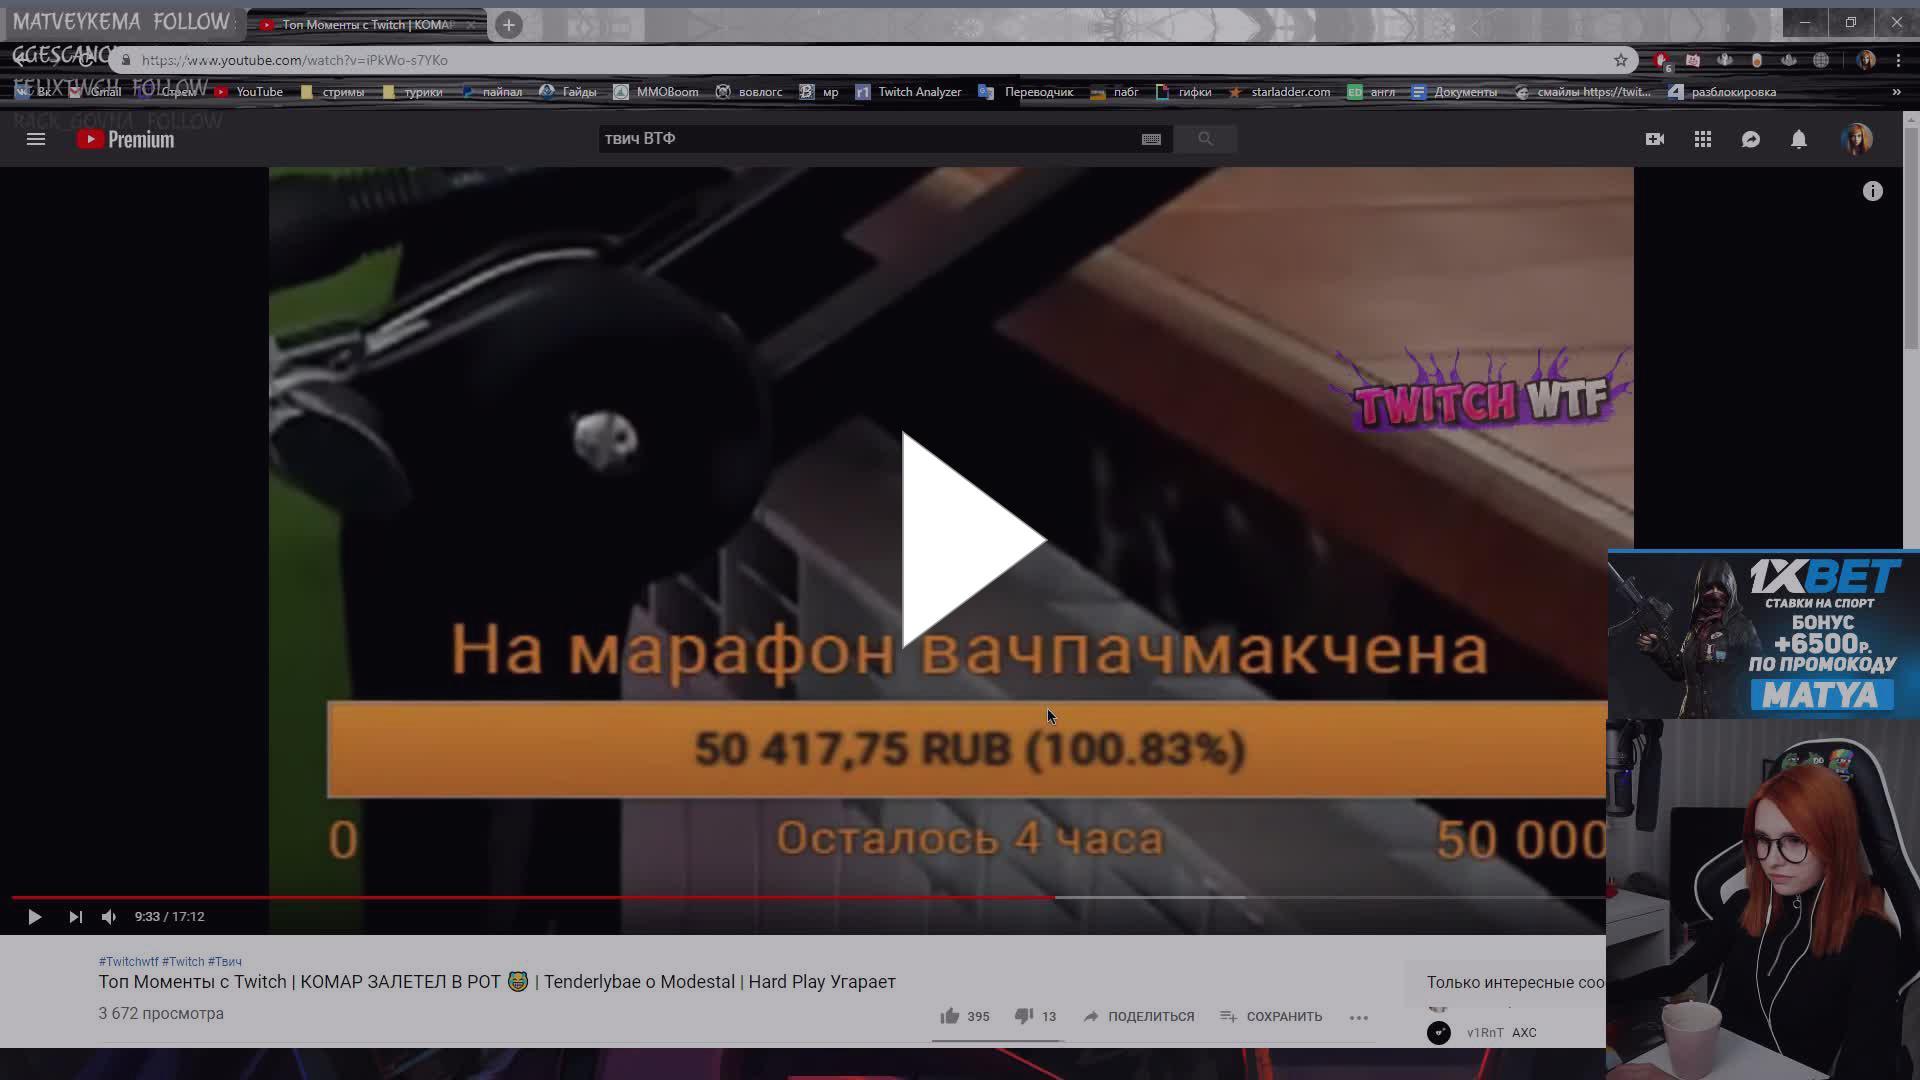 Smorodinova - ич пач мак - Twitch